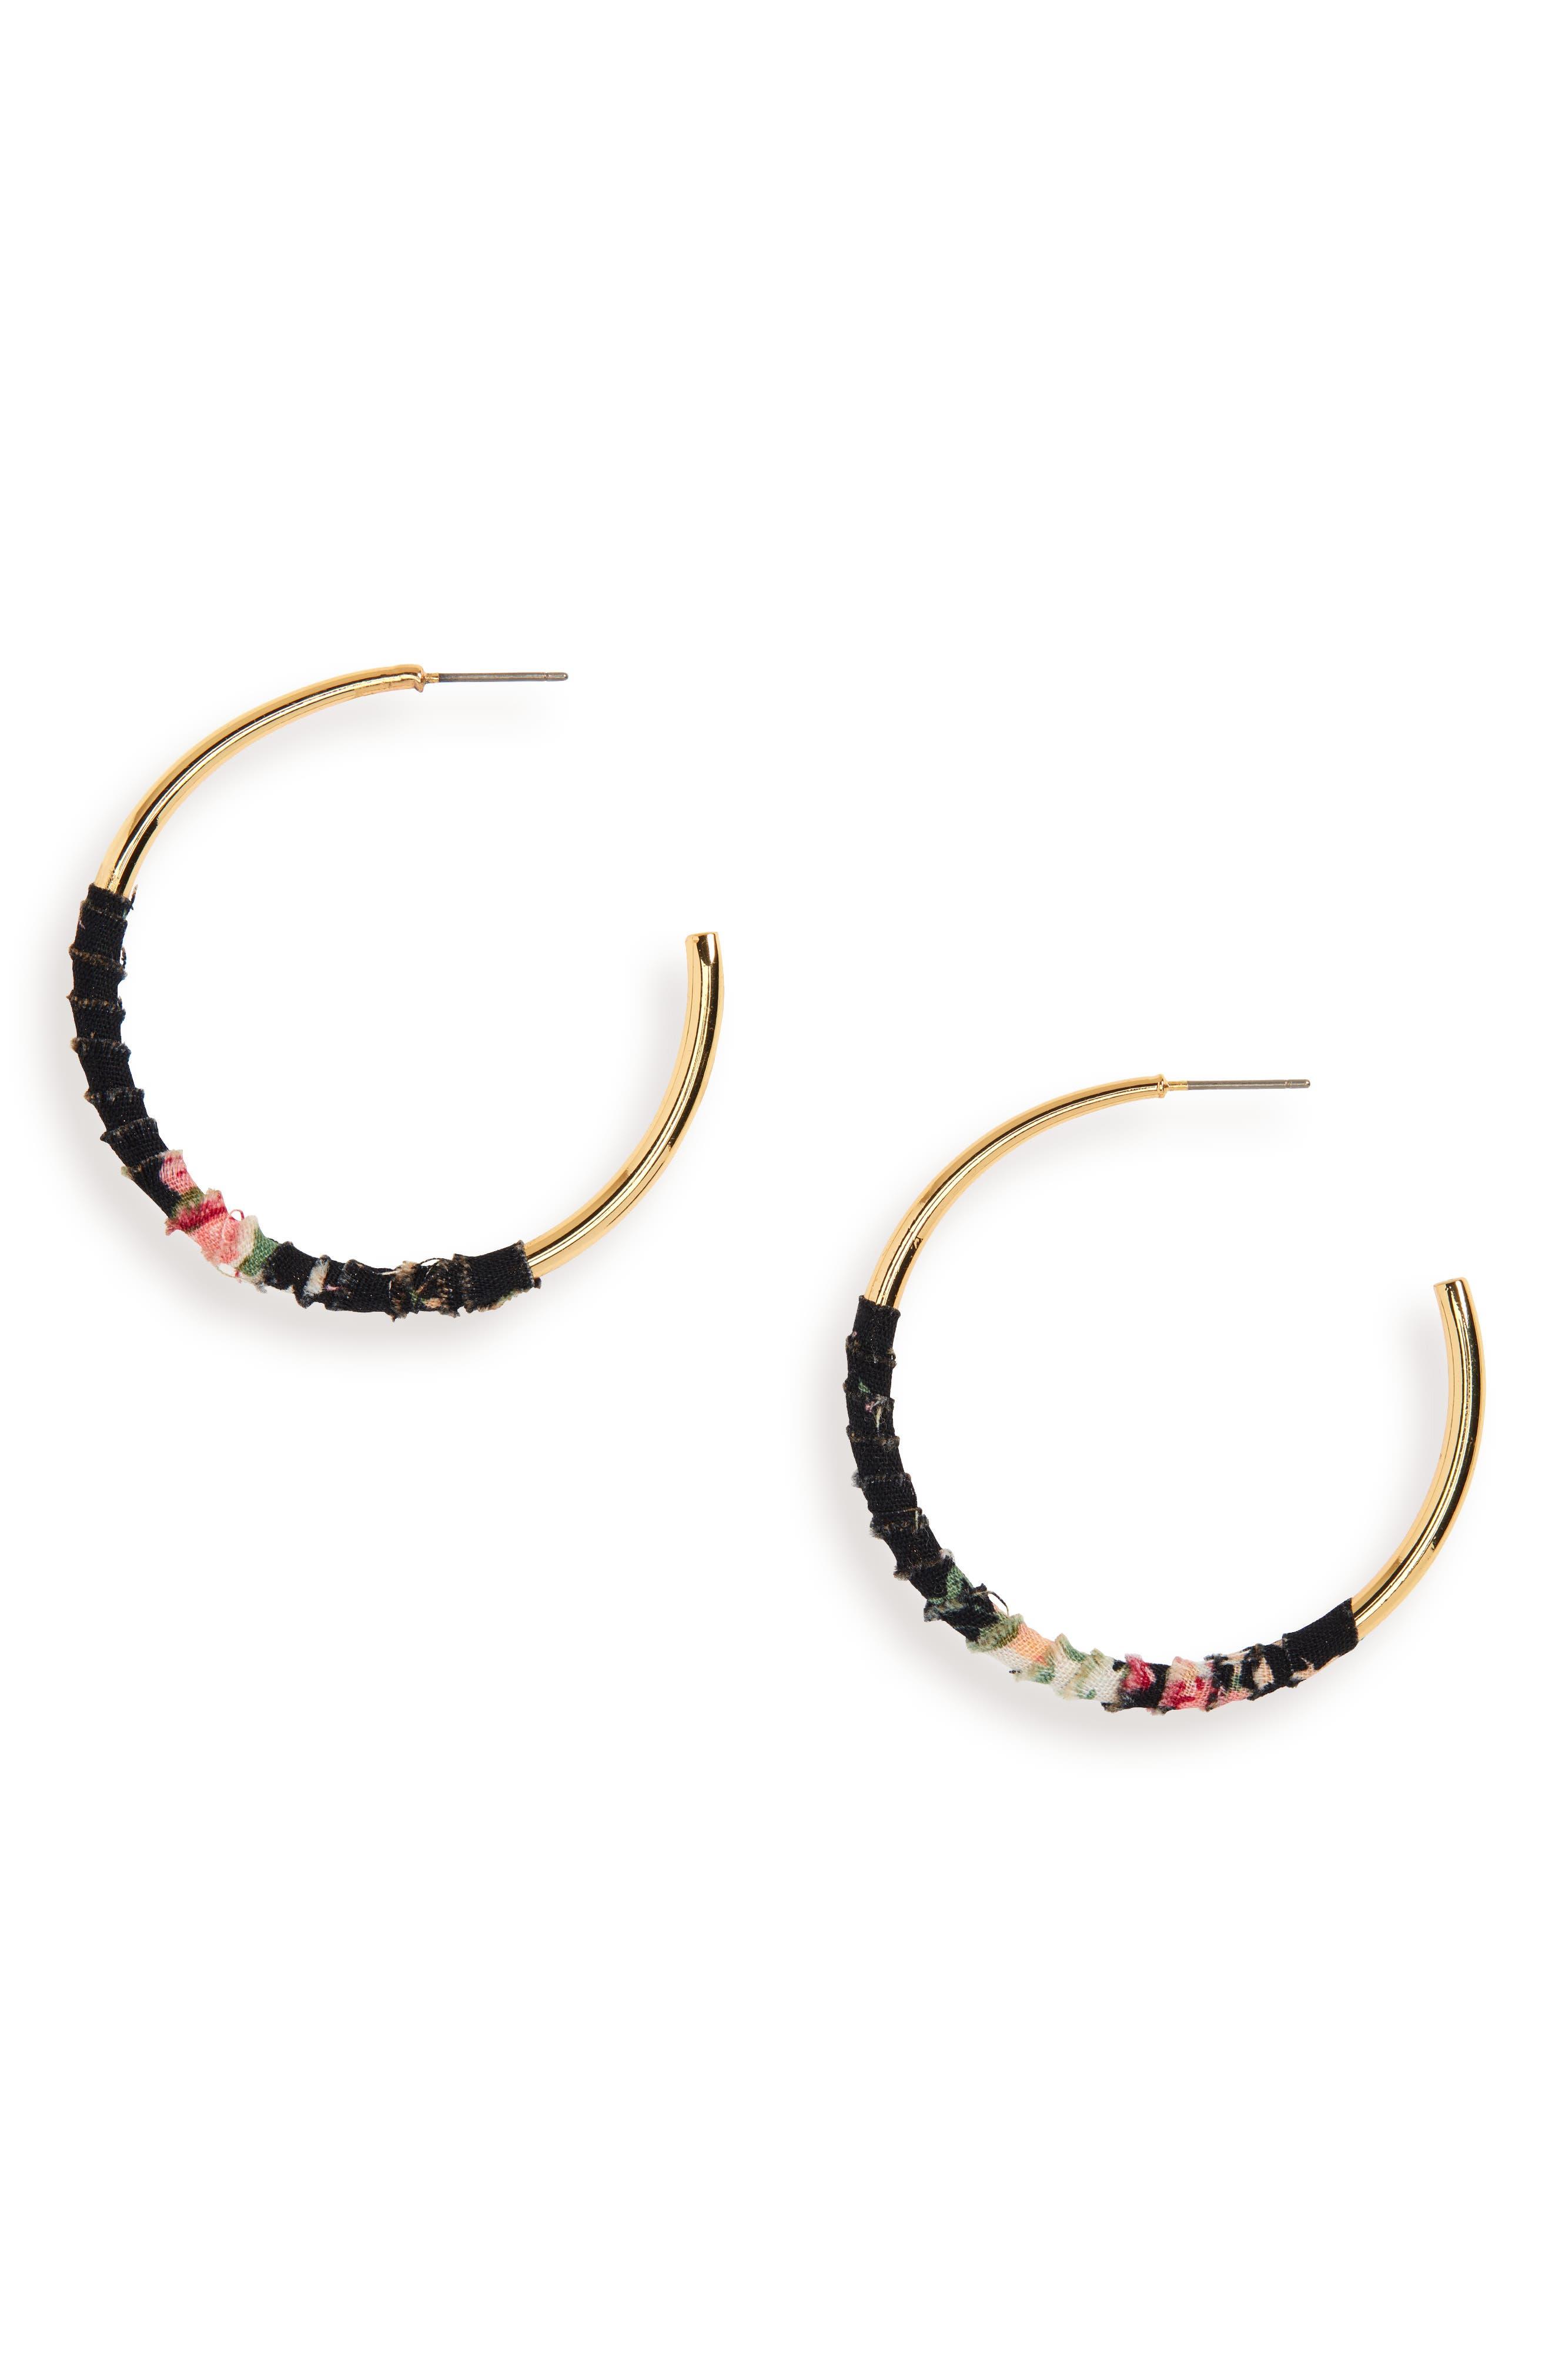 UNCOMMON JAMES BY KRISTIN CAVALLARI, Womanizer Hoop Earrings, Main thumbnail 1, color, 710